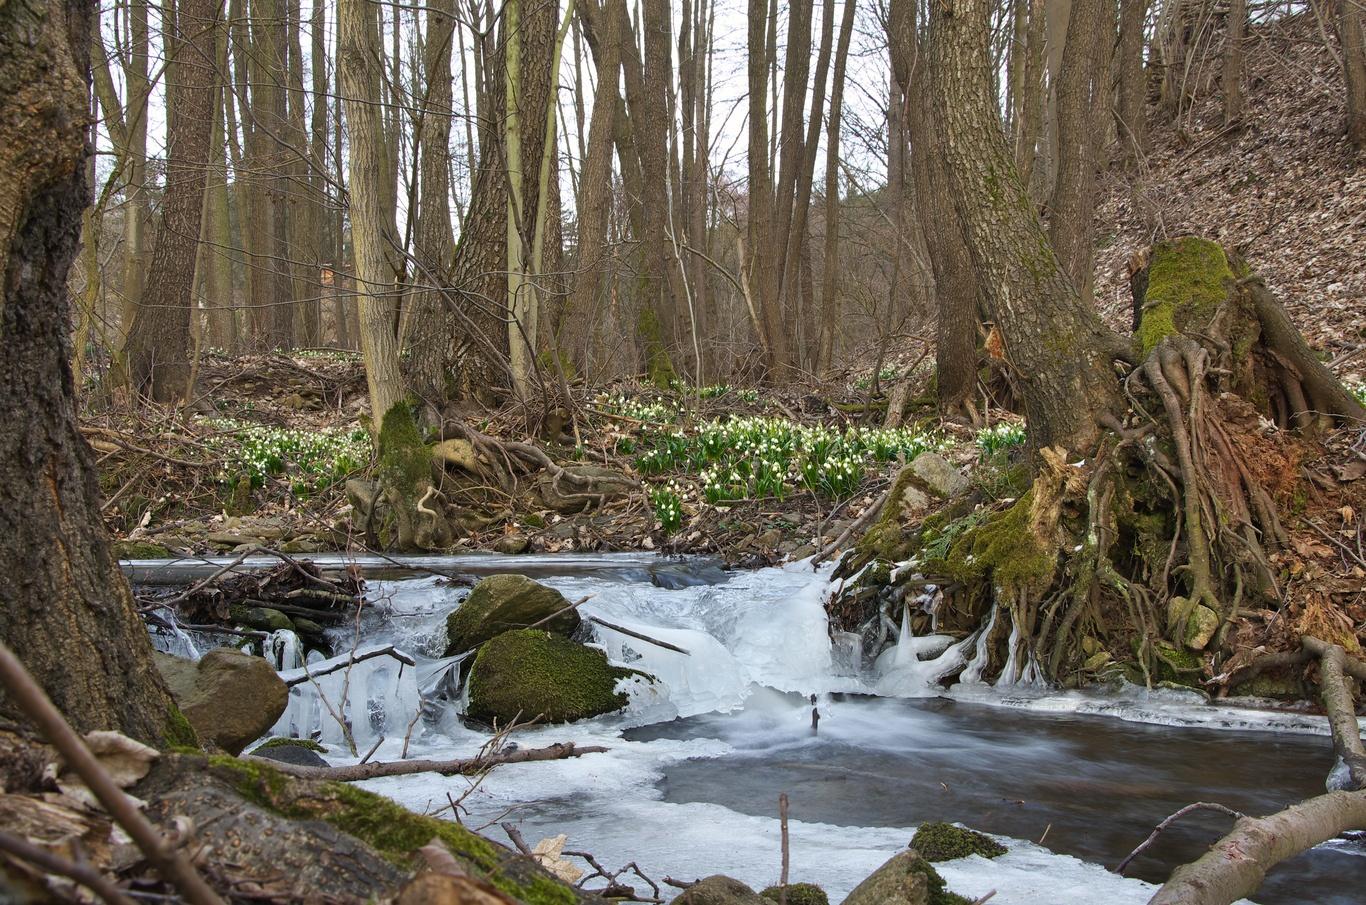 Údolí Chlébského potoka